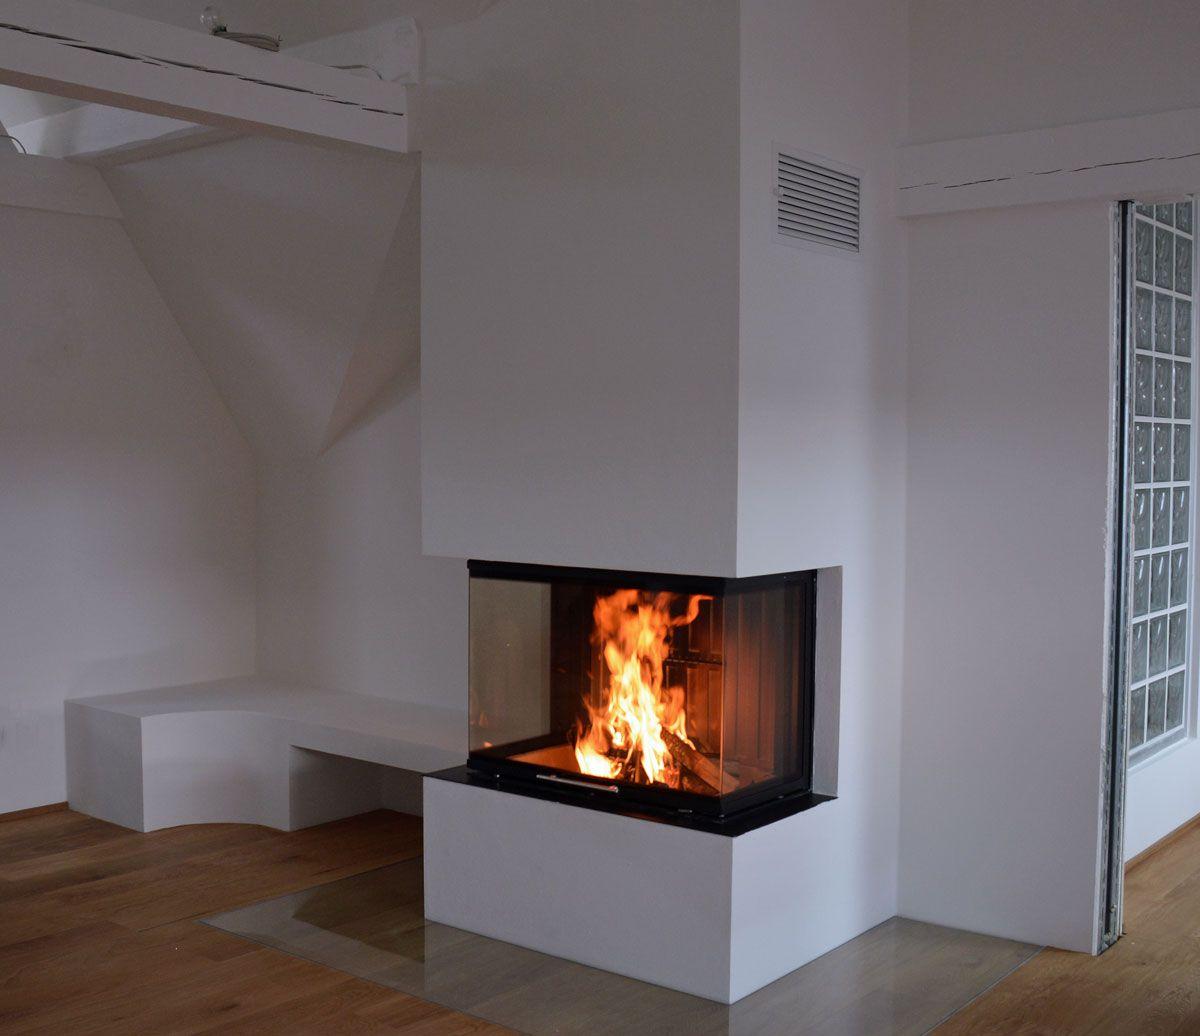 moderner heizkamin mit 3 seitiger verglasung und anschlie ender gemauerter ofenbank moderner. Black Bedroom Furniture Sets. Home Design Ideas